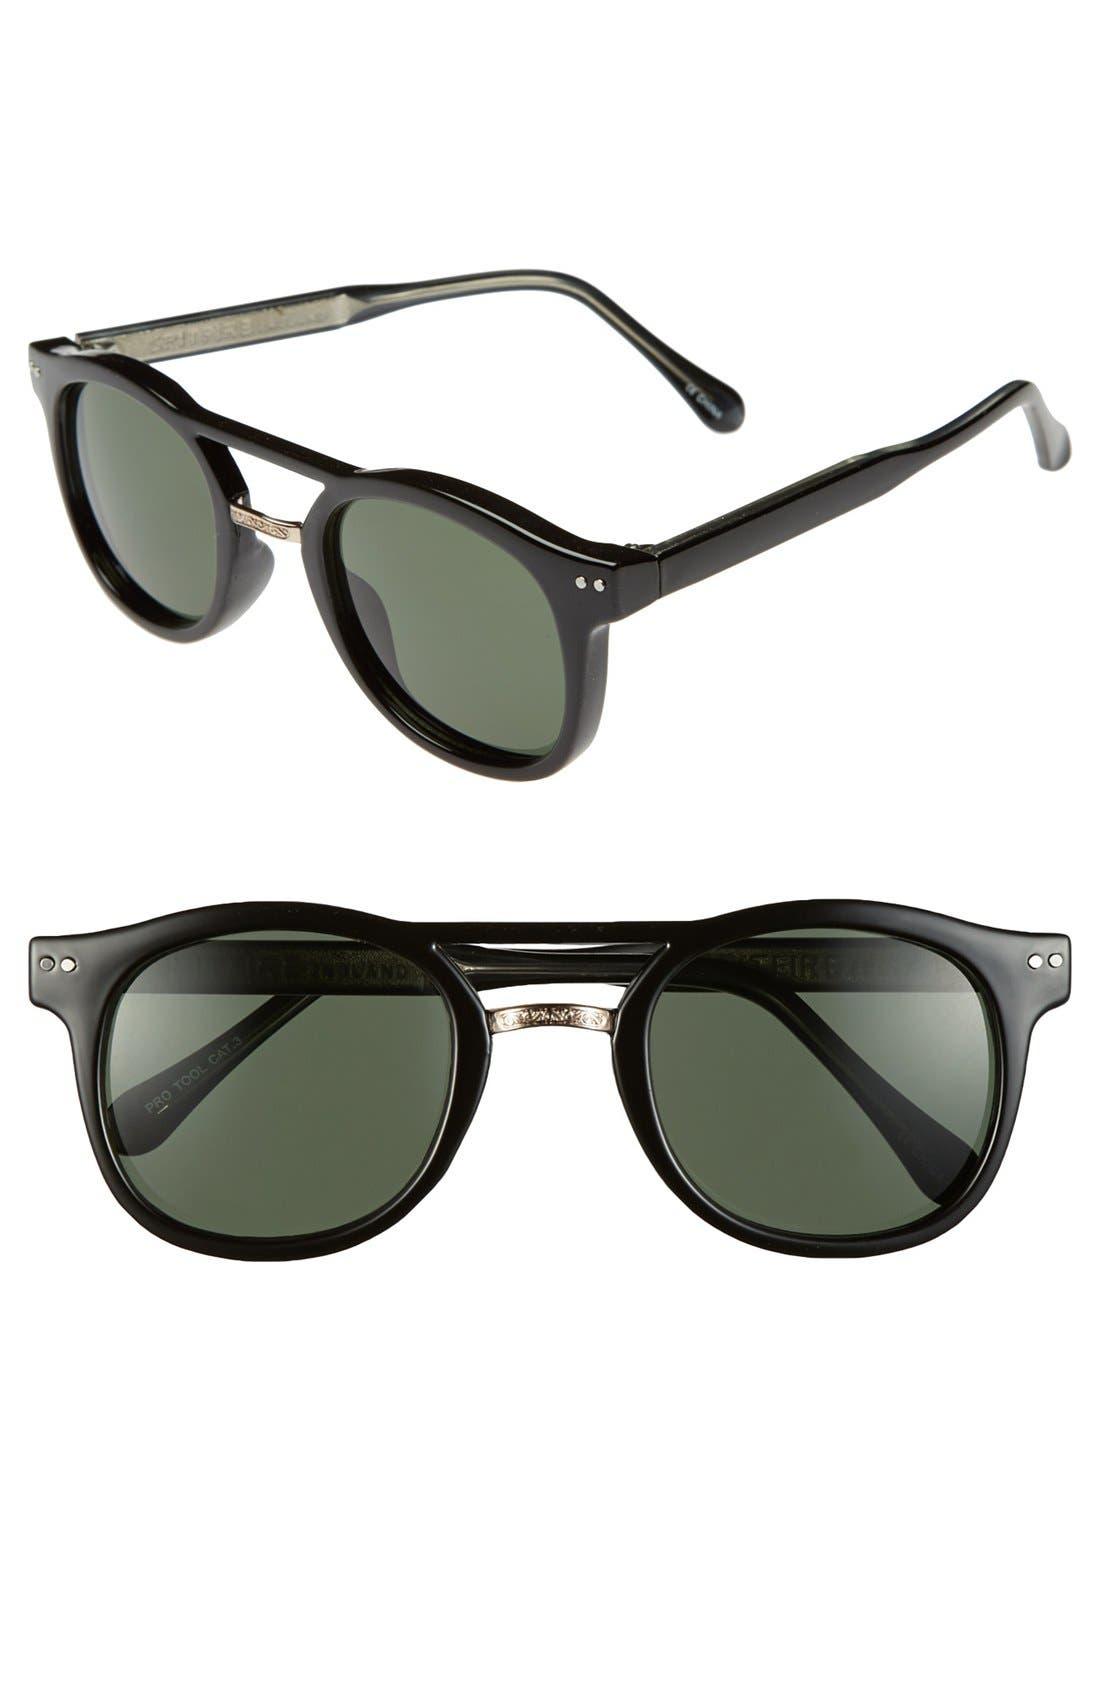 Alternate Image 1 Selected - Spitfire 'Protool' 50mm Retro Sunglasses